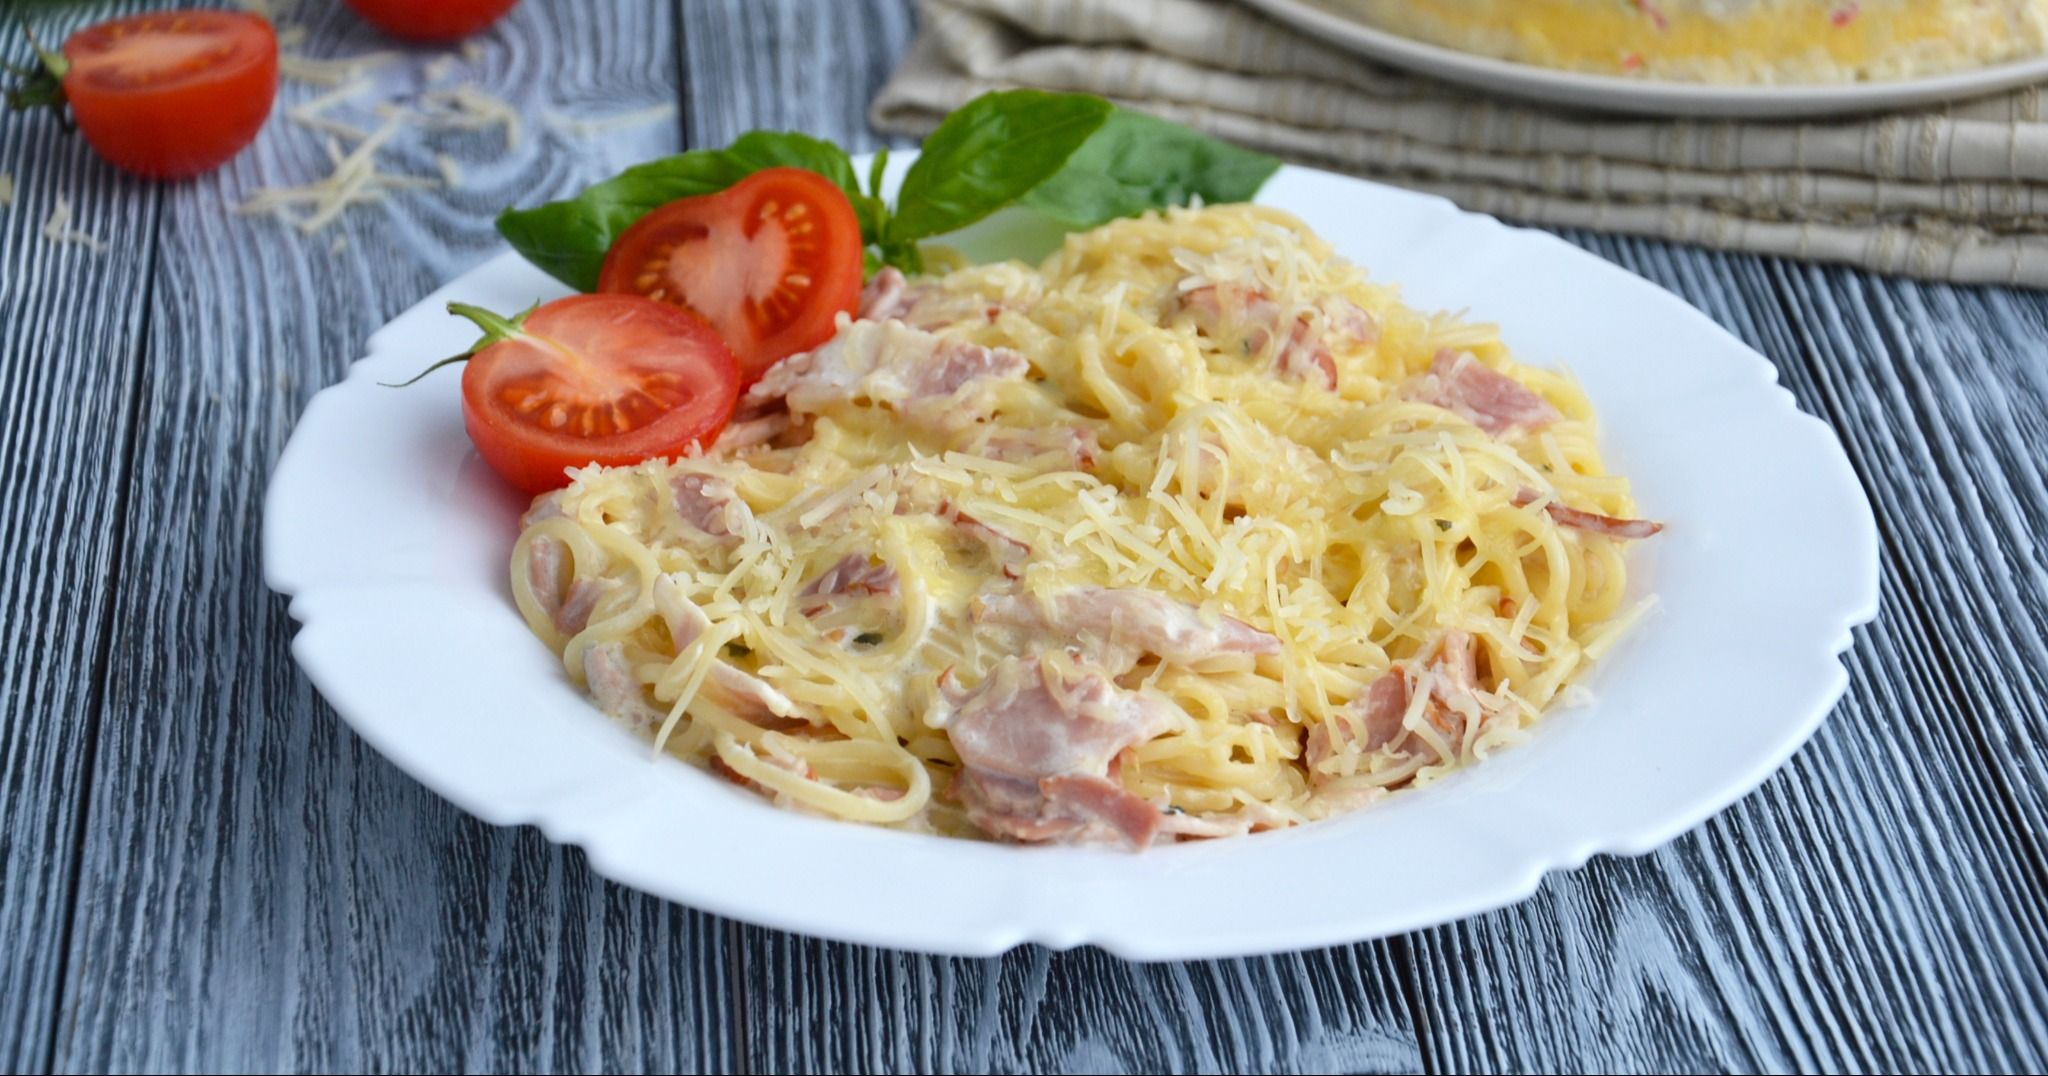 данный момент спагетти карбонара рецепт с фото в домашних территории